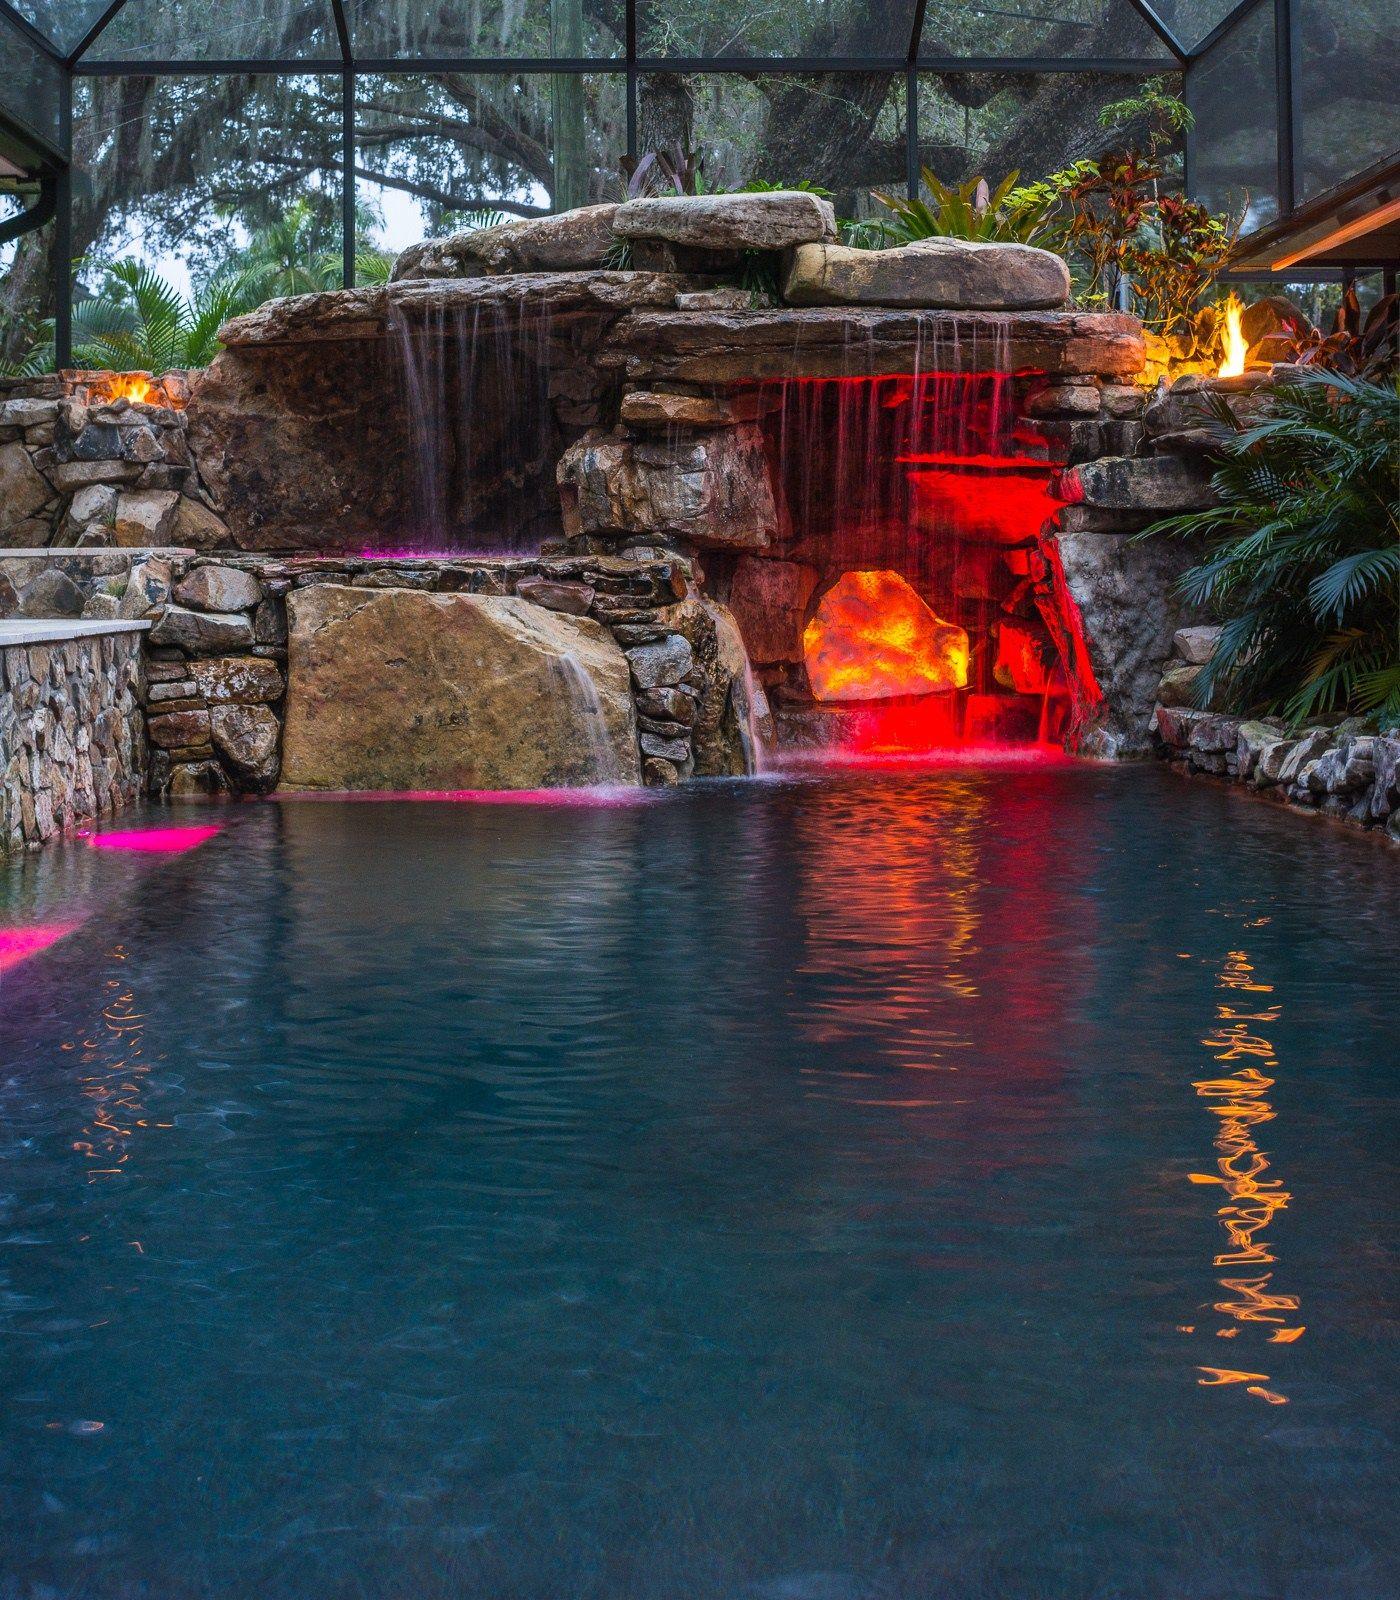 Lucas Lagoons Insane Pools Jungle 2 Swimming Pool House Backyard Pool Insane Pools